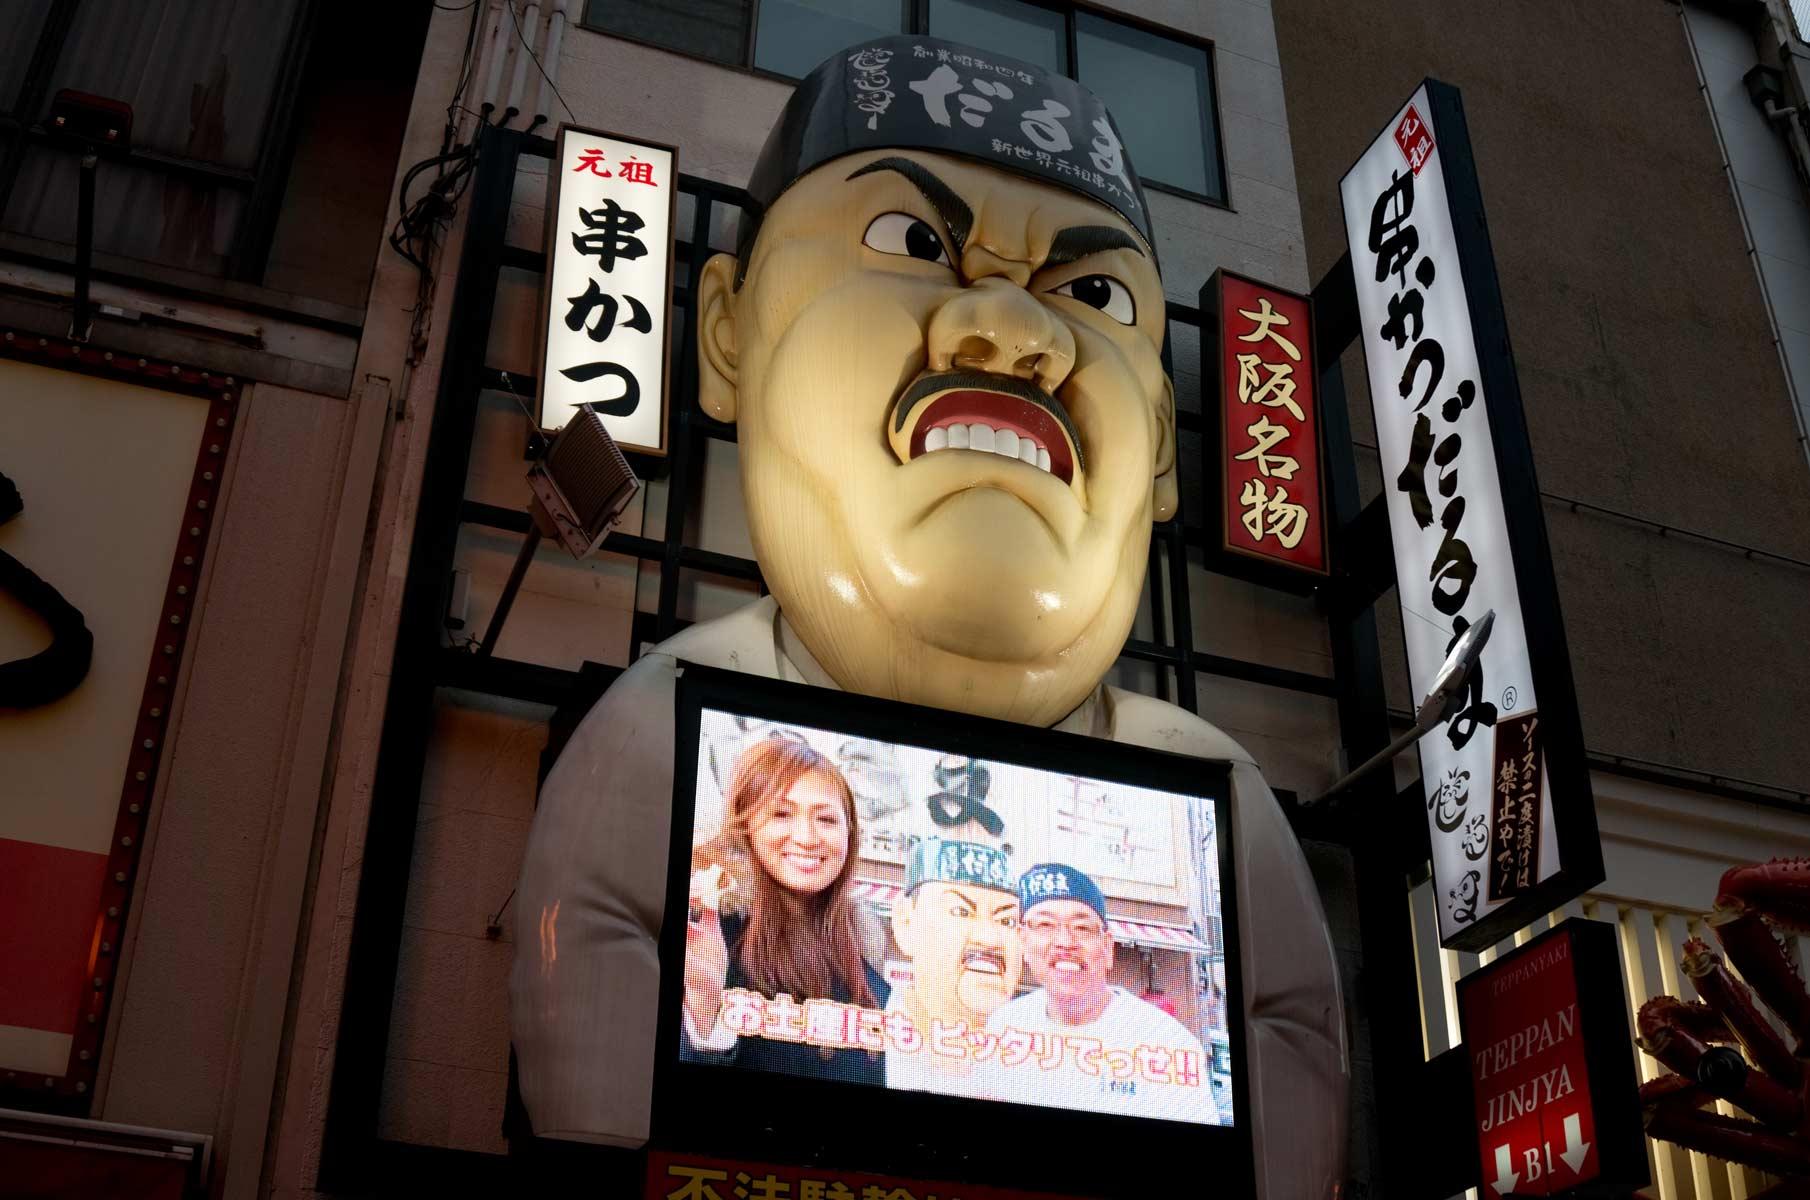 Fisch Restraurant in Dotonbori Osaka, Japan